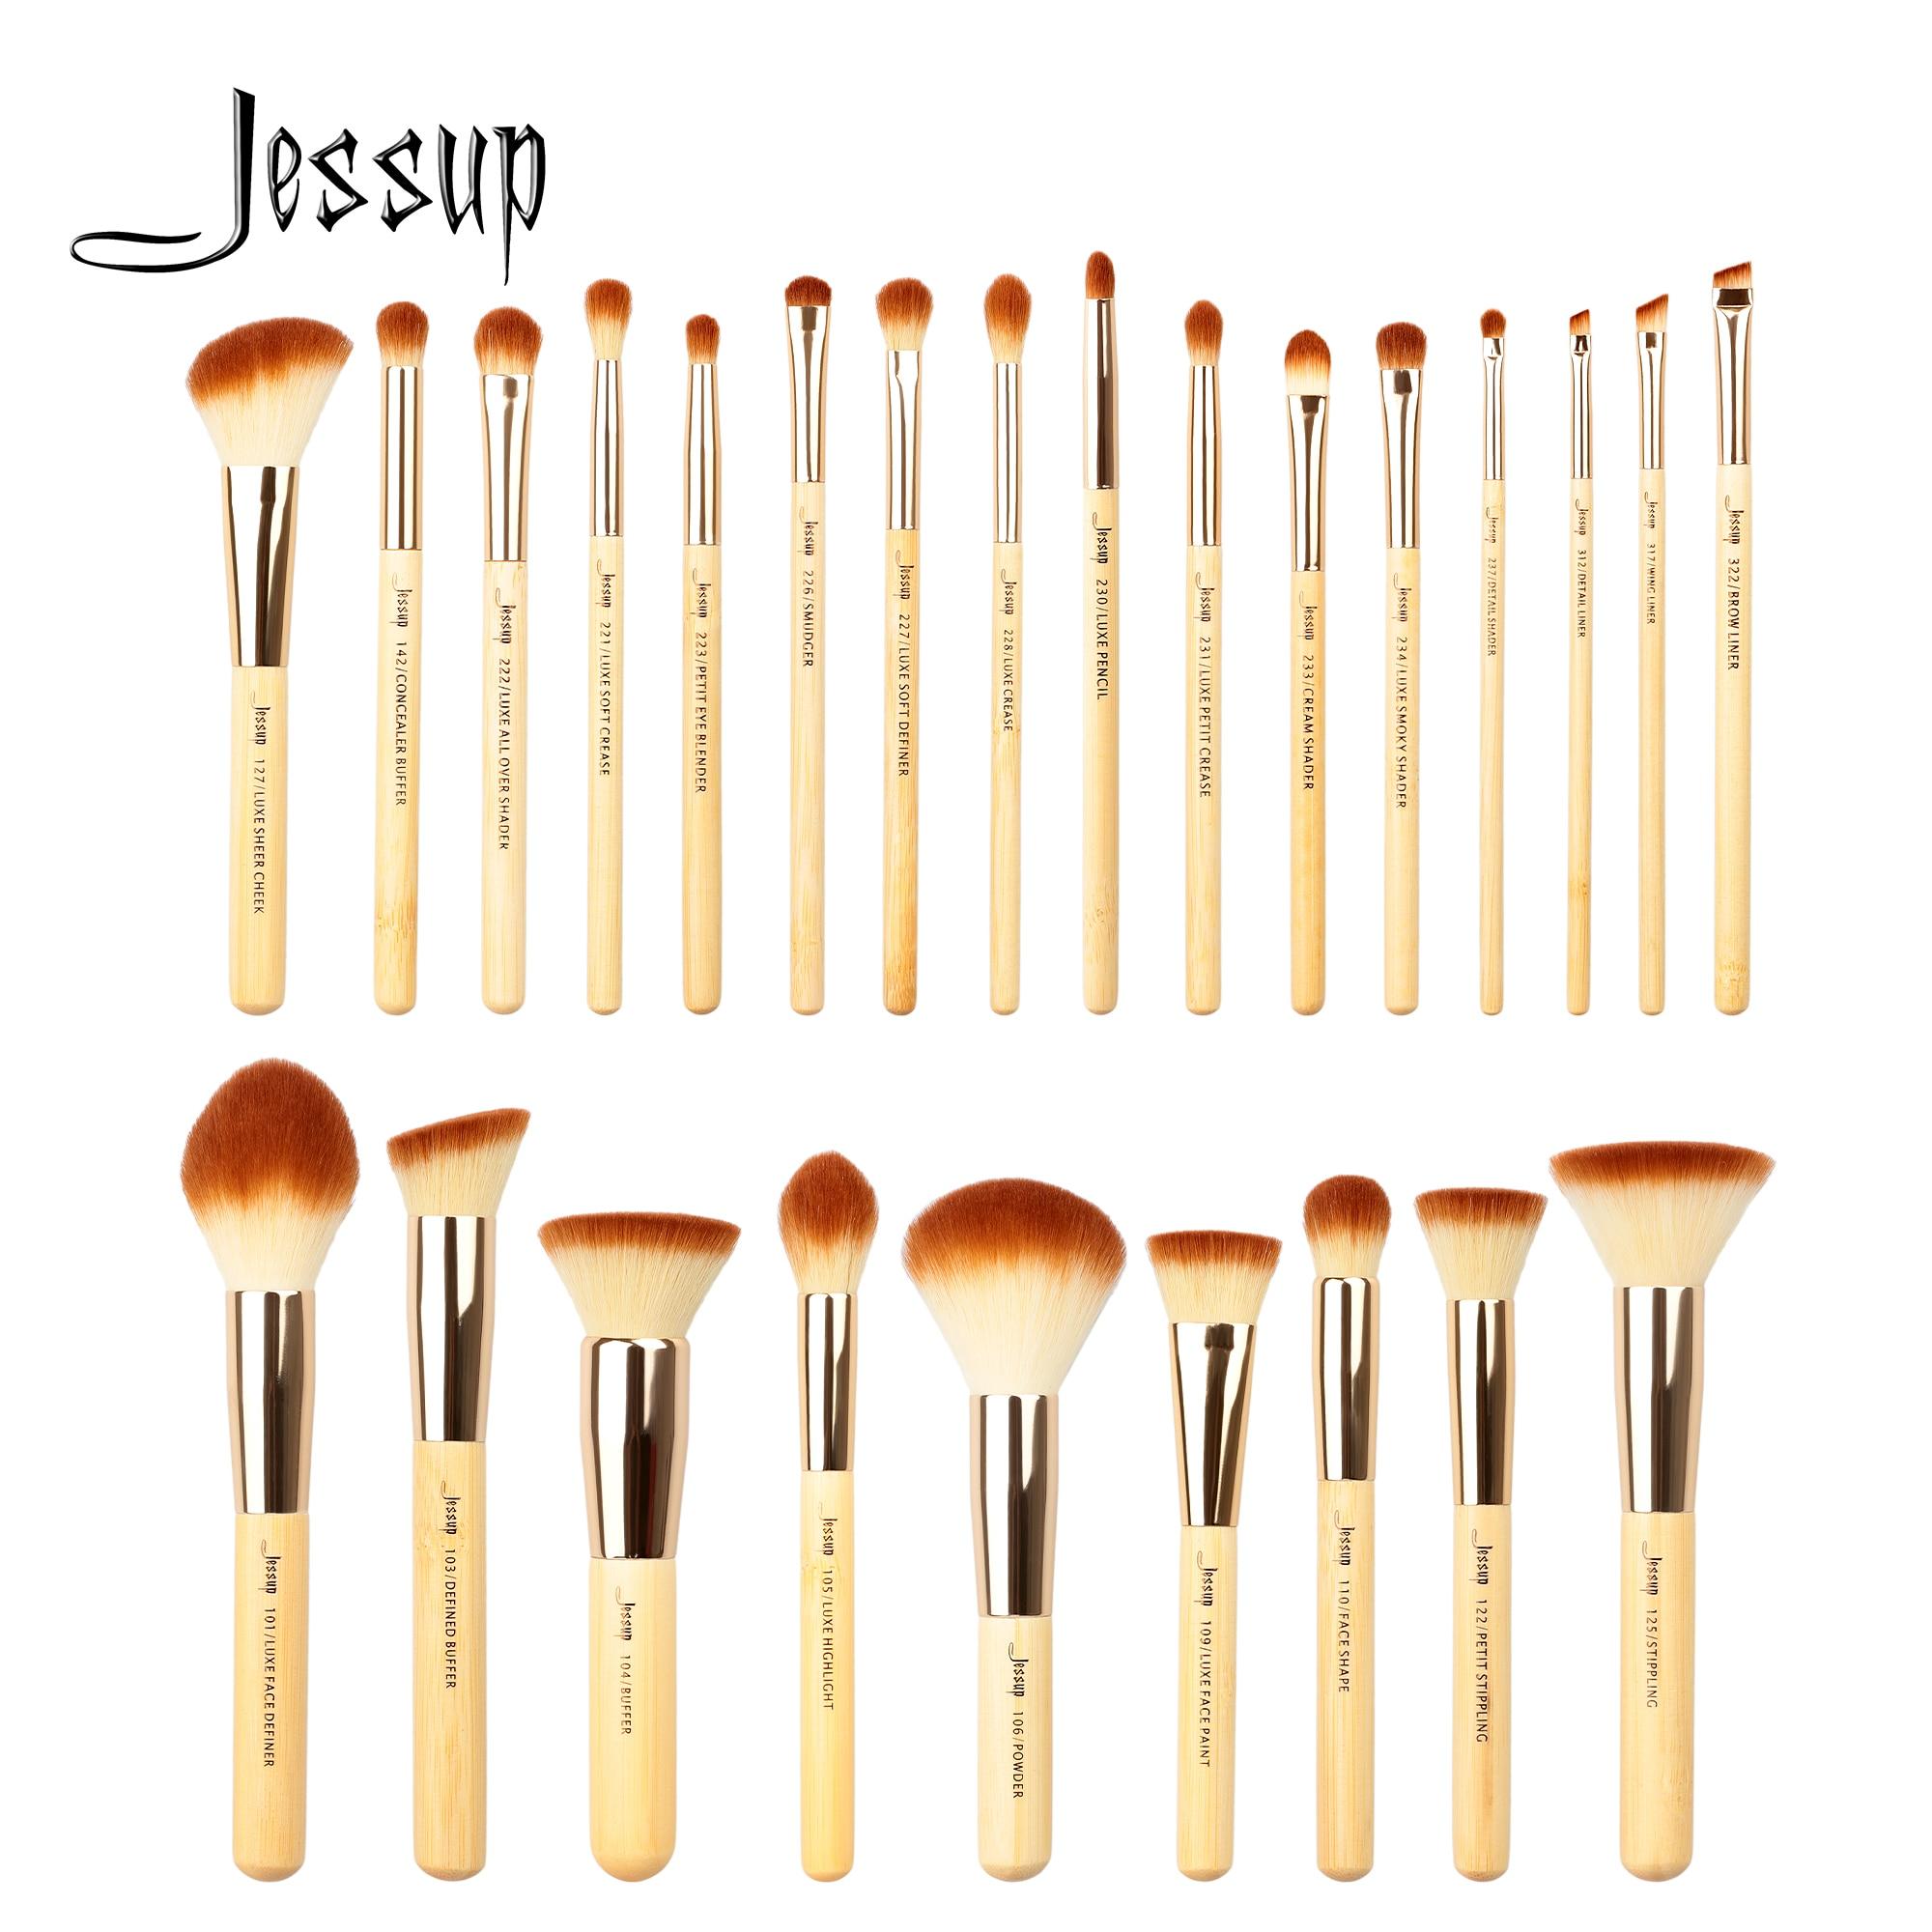 jessup conjunto de pinceis de maquiagem de bambu pincel de base em po delineador